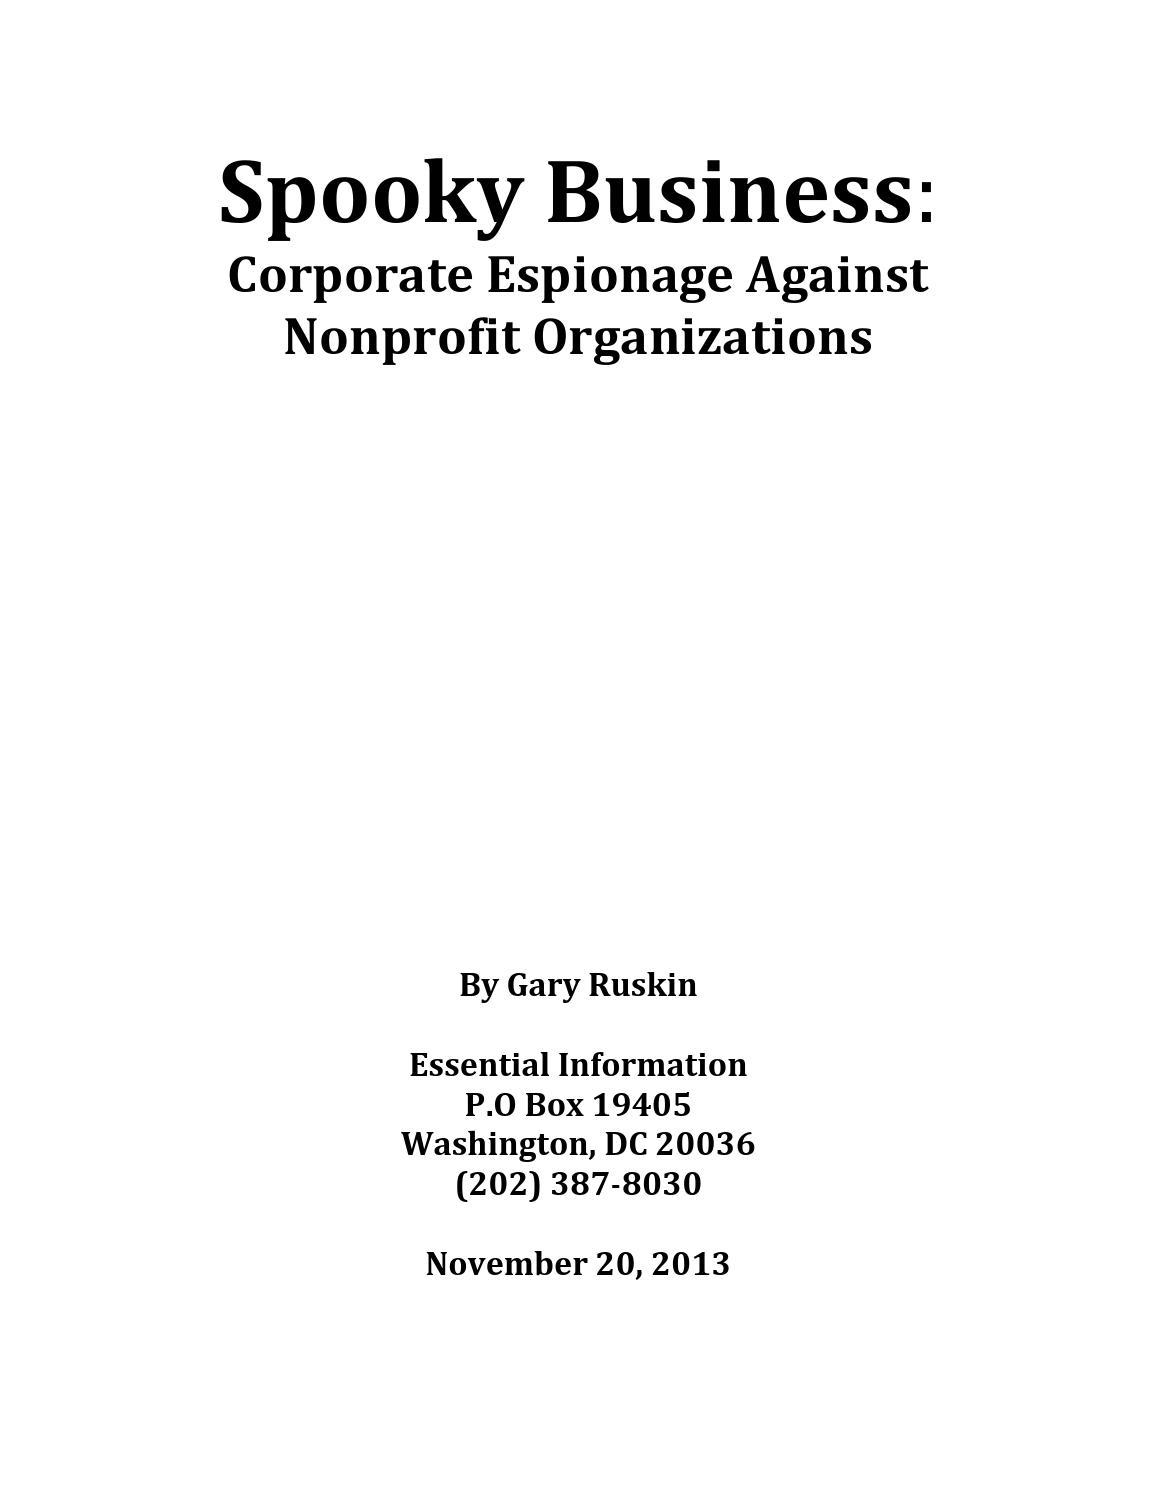 Spooky Business Corporate Espionage Against Nonprofit Organizations